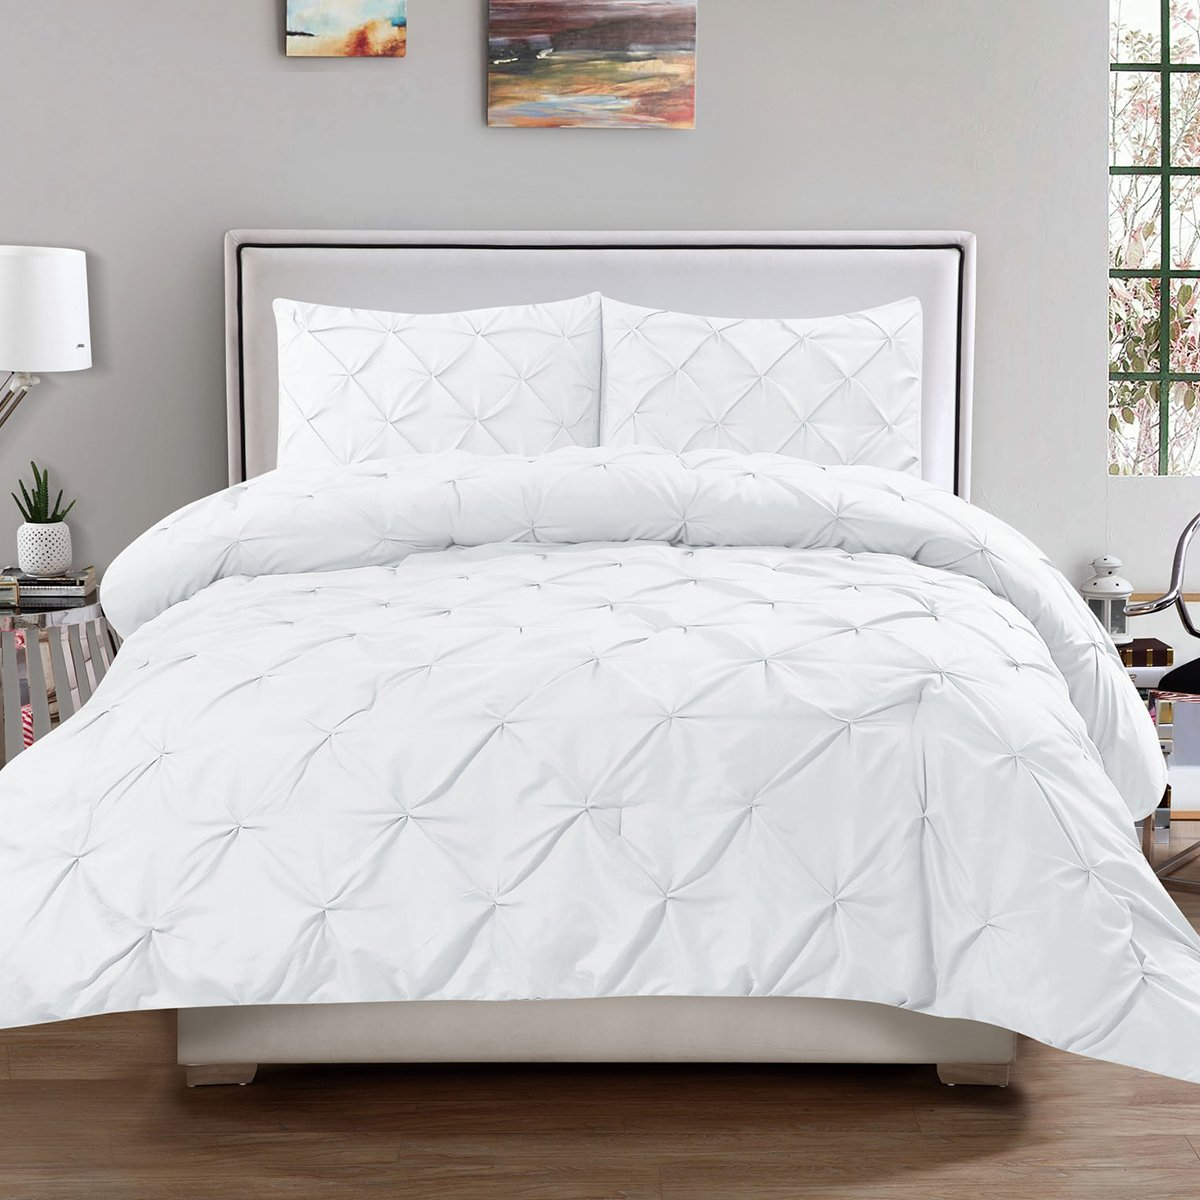 Sweet Home Collection 3 Piece Luxury Pinch Pleat Pintuck Fashion Duvet Set, Queen, White